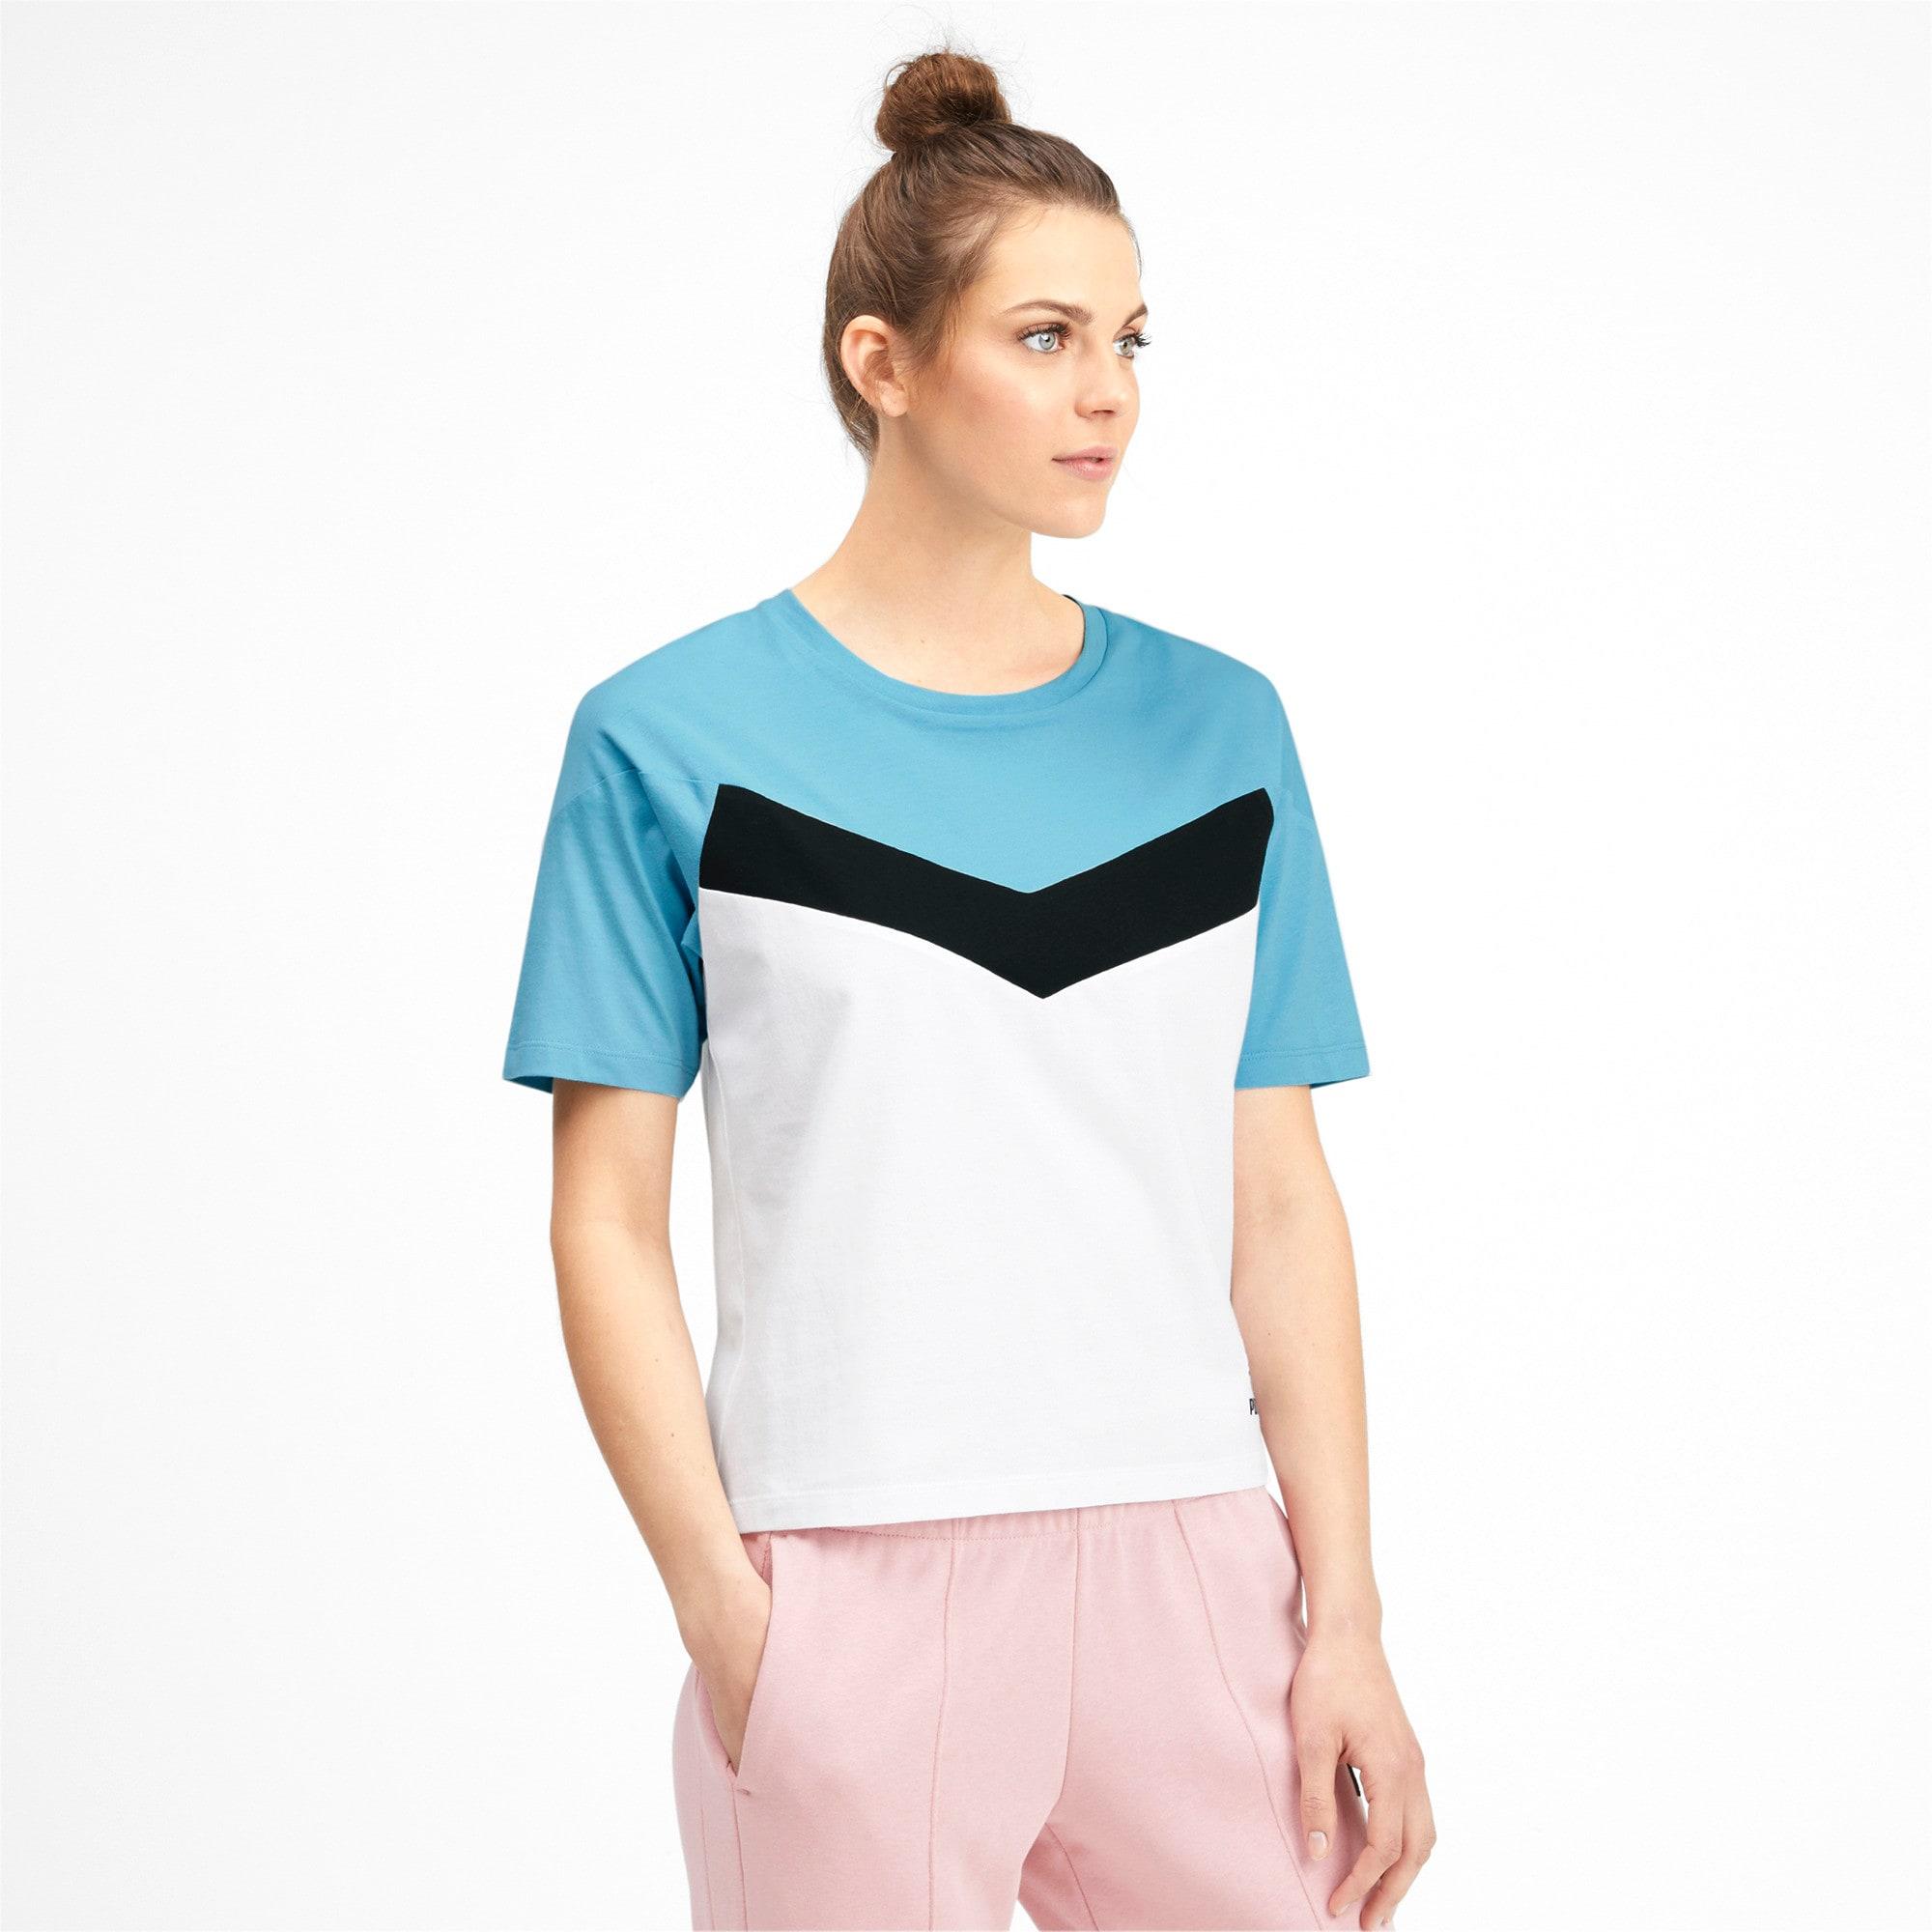 Miniatura 1 de Camiseta PUMA XTG en colores combinados para mujer, Puma White, mediano